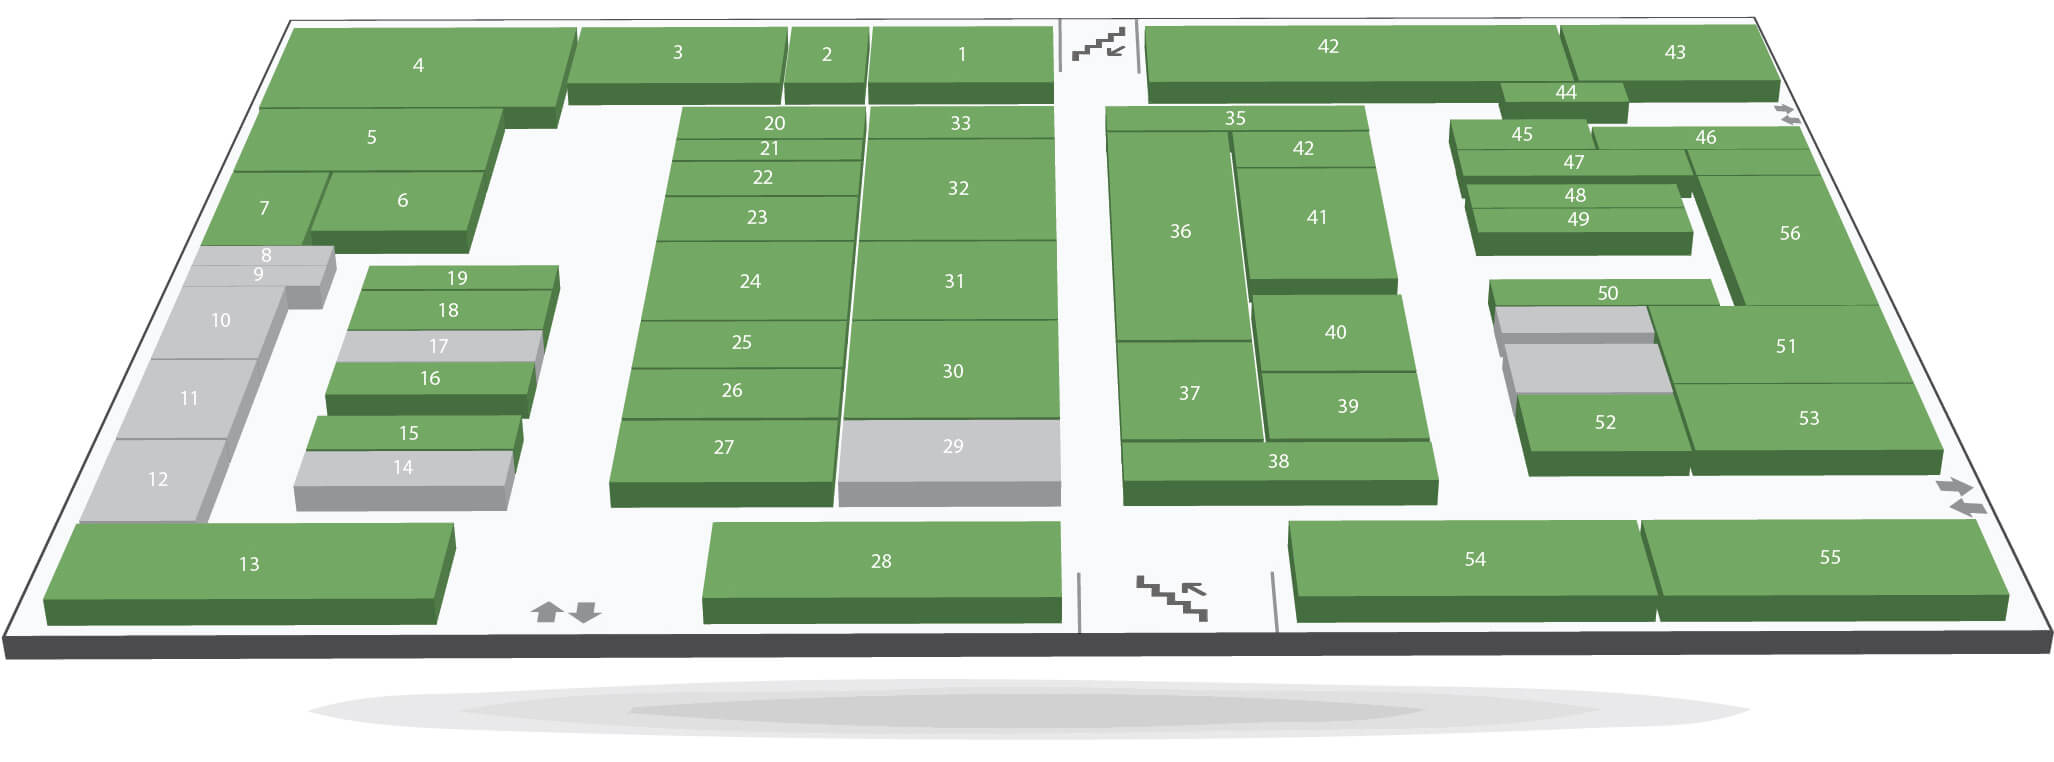 план этажей 2 этаж